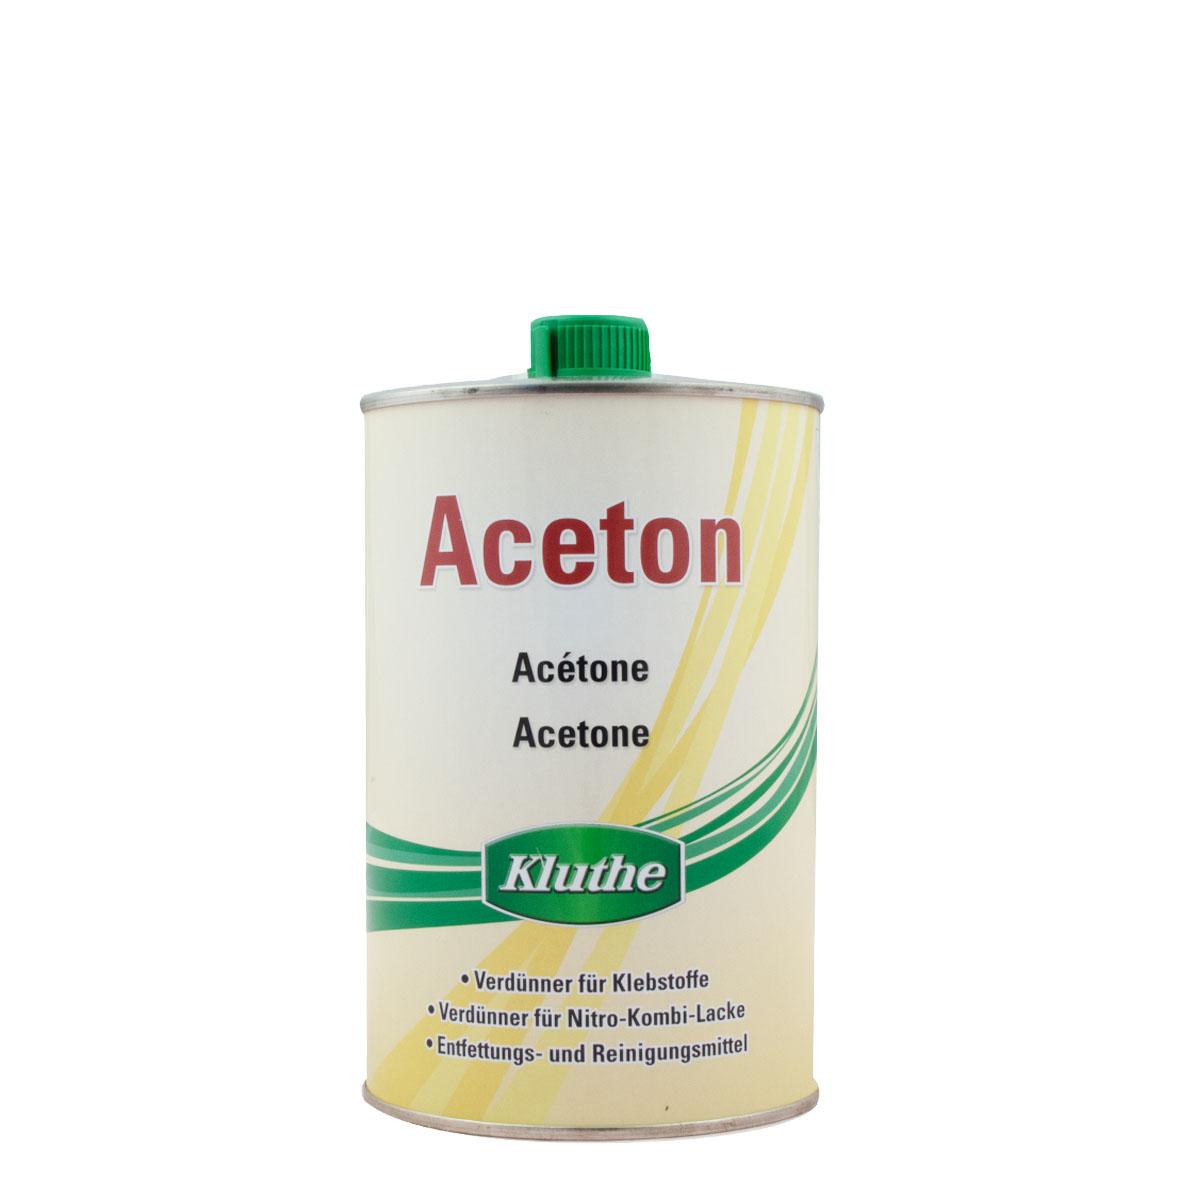 Kluthe Aceton 1L, Reiniger, Entfetter, Verdünner